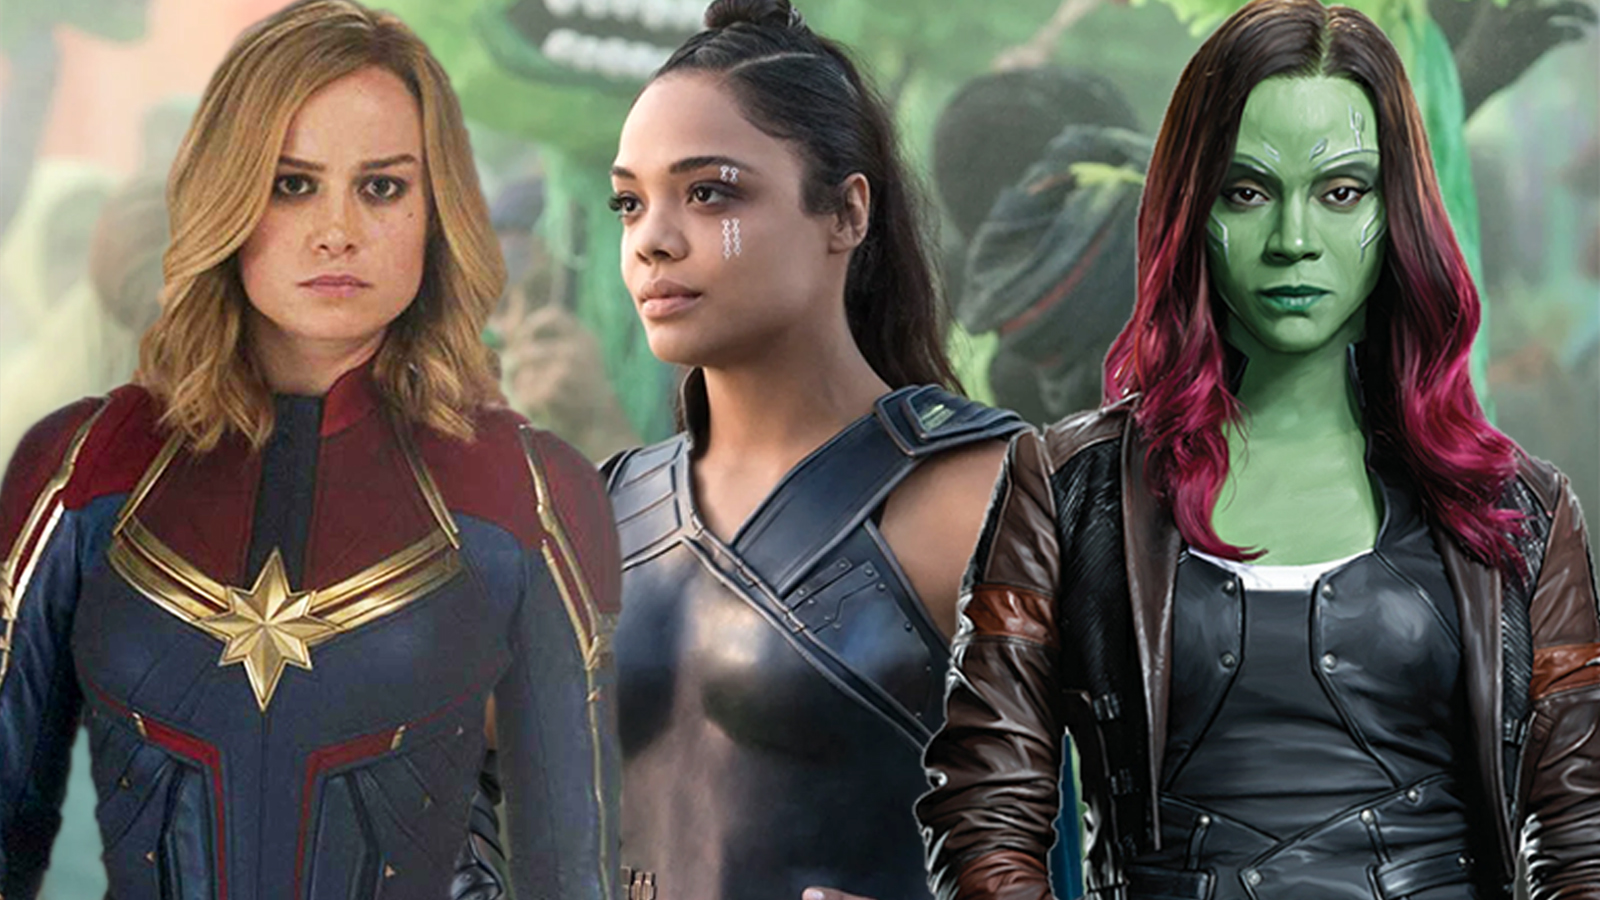 Captain Marvel, Valkyrie and Gamora in Avengers